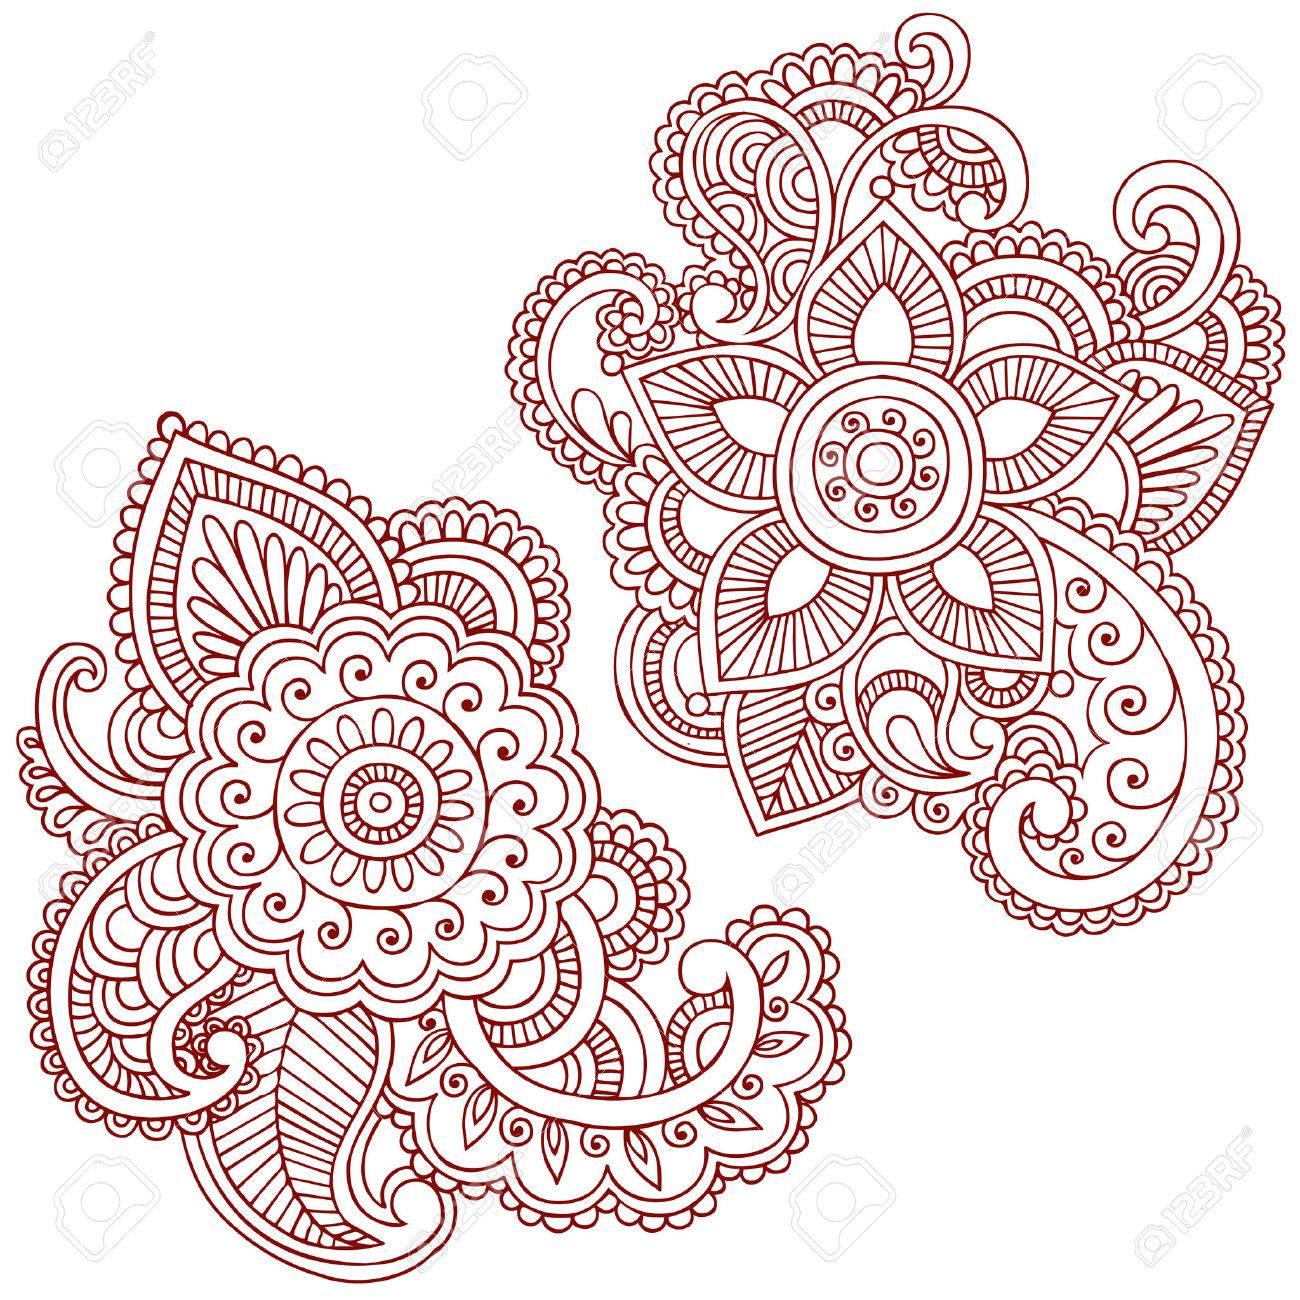 Hand-Drawn Abstract Henna (mehndi) Paisley Doodle Illustration Design Elements Stock Vector - 6807548